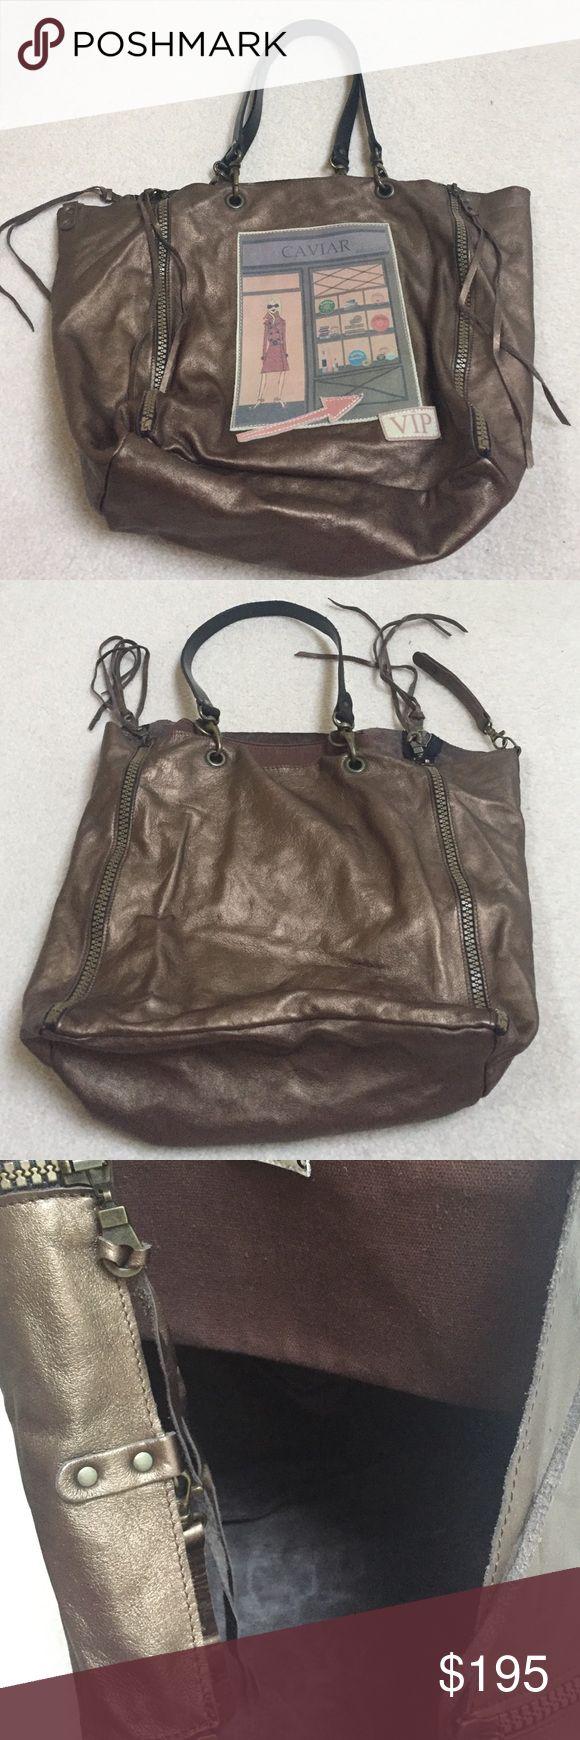 Bronze Barbara Rihl Large Tote Amazing bag. Soft leather. Bronze color. Like new. Make an offer! Barbara Rihl Bags